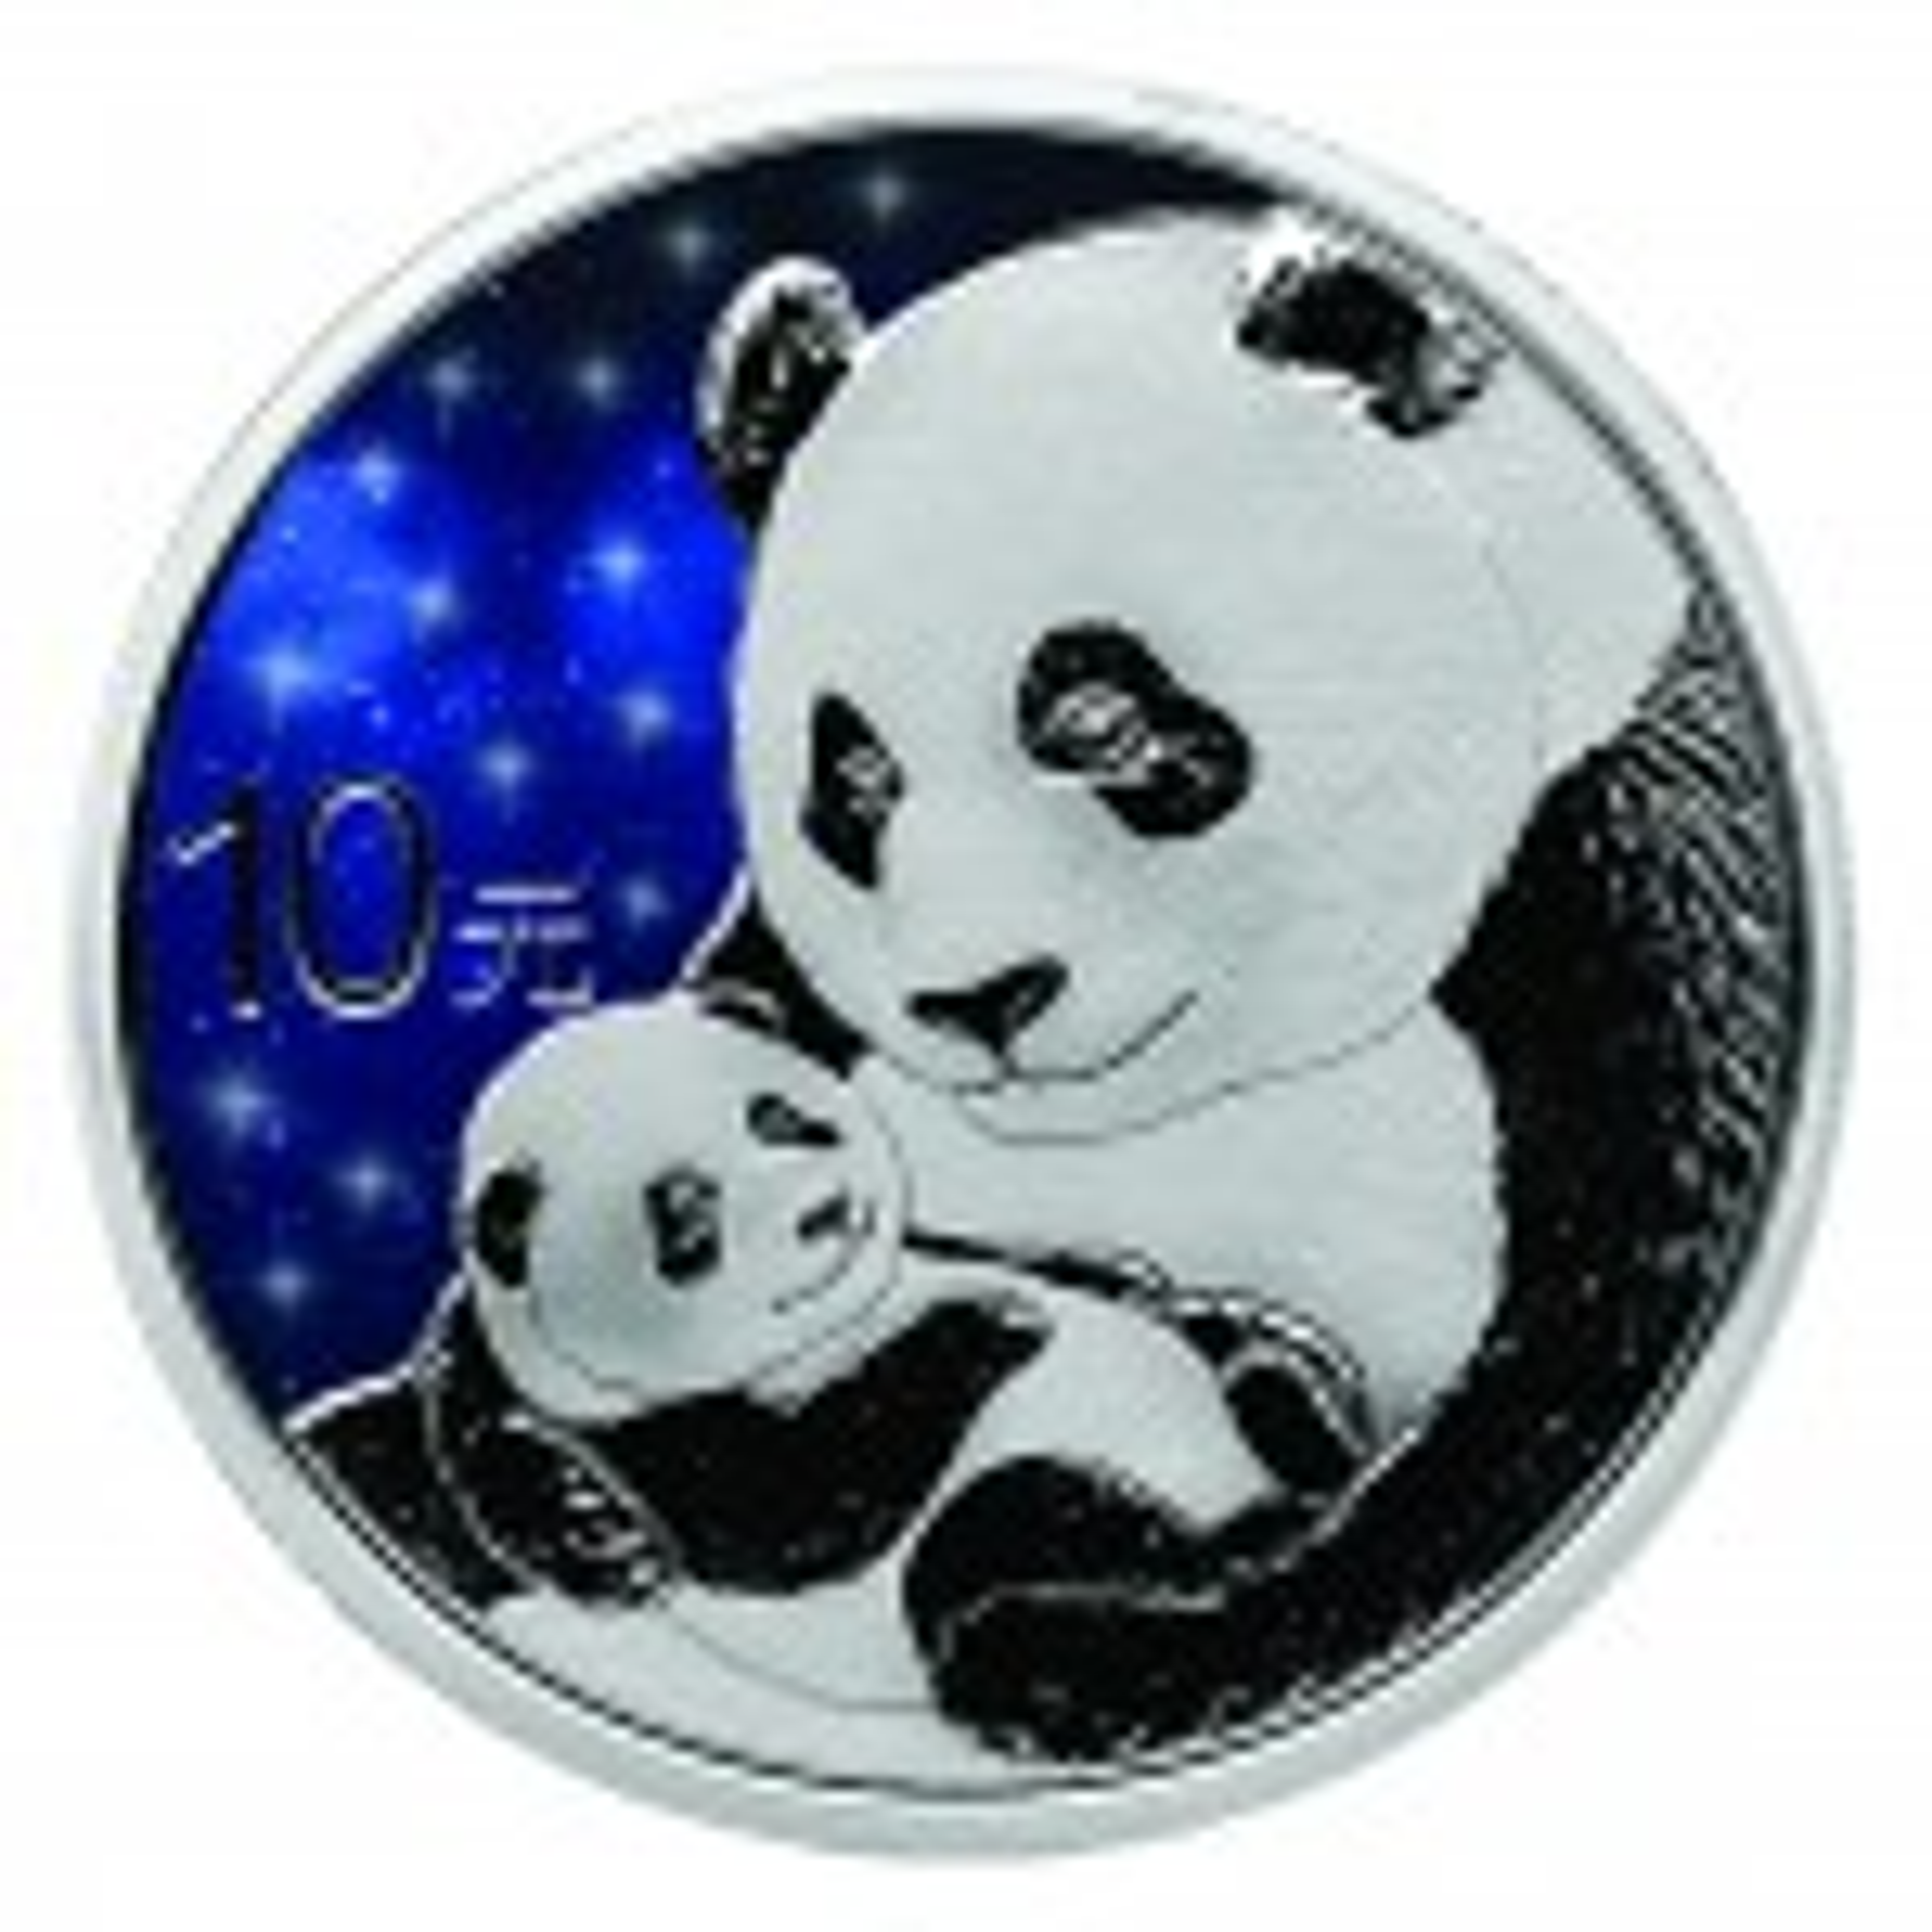 30 Gram zilveren munt Glowing Galaxy Panda 2019